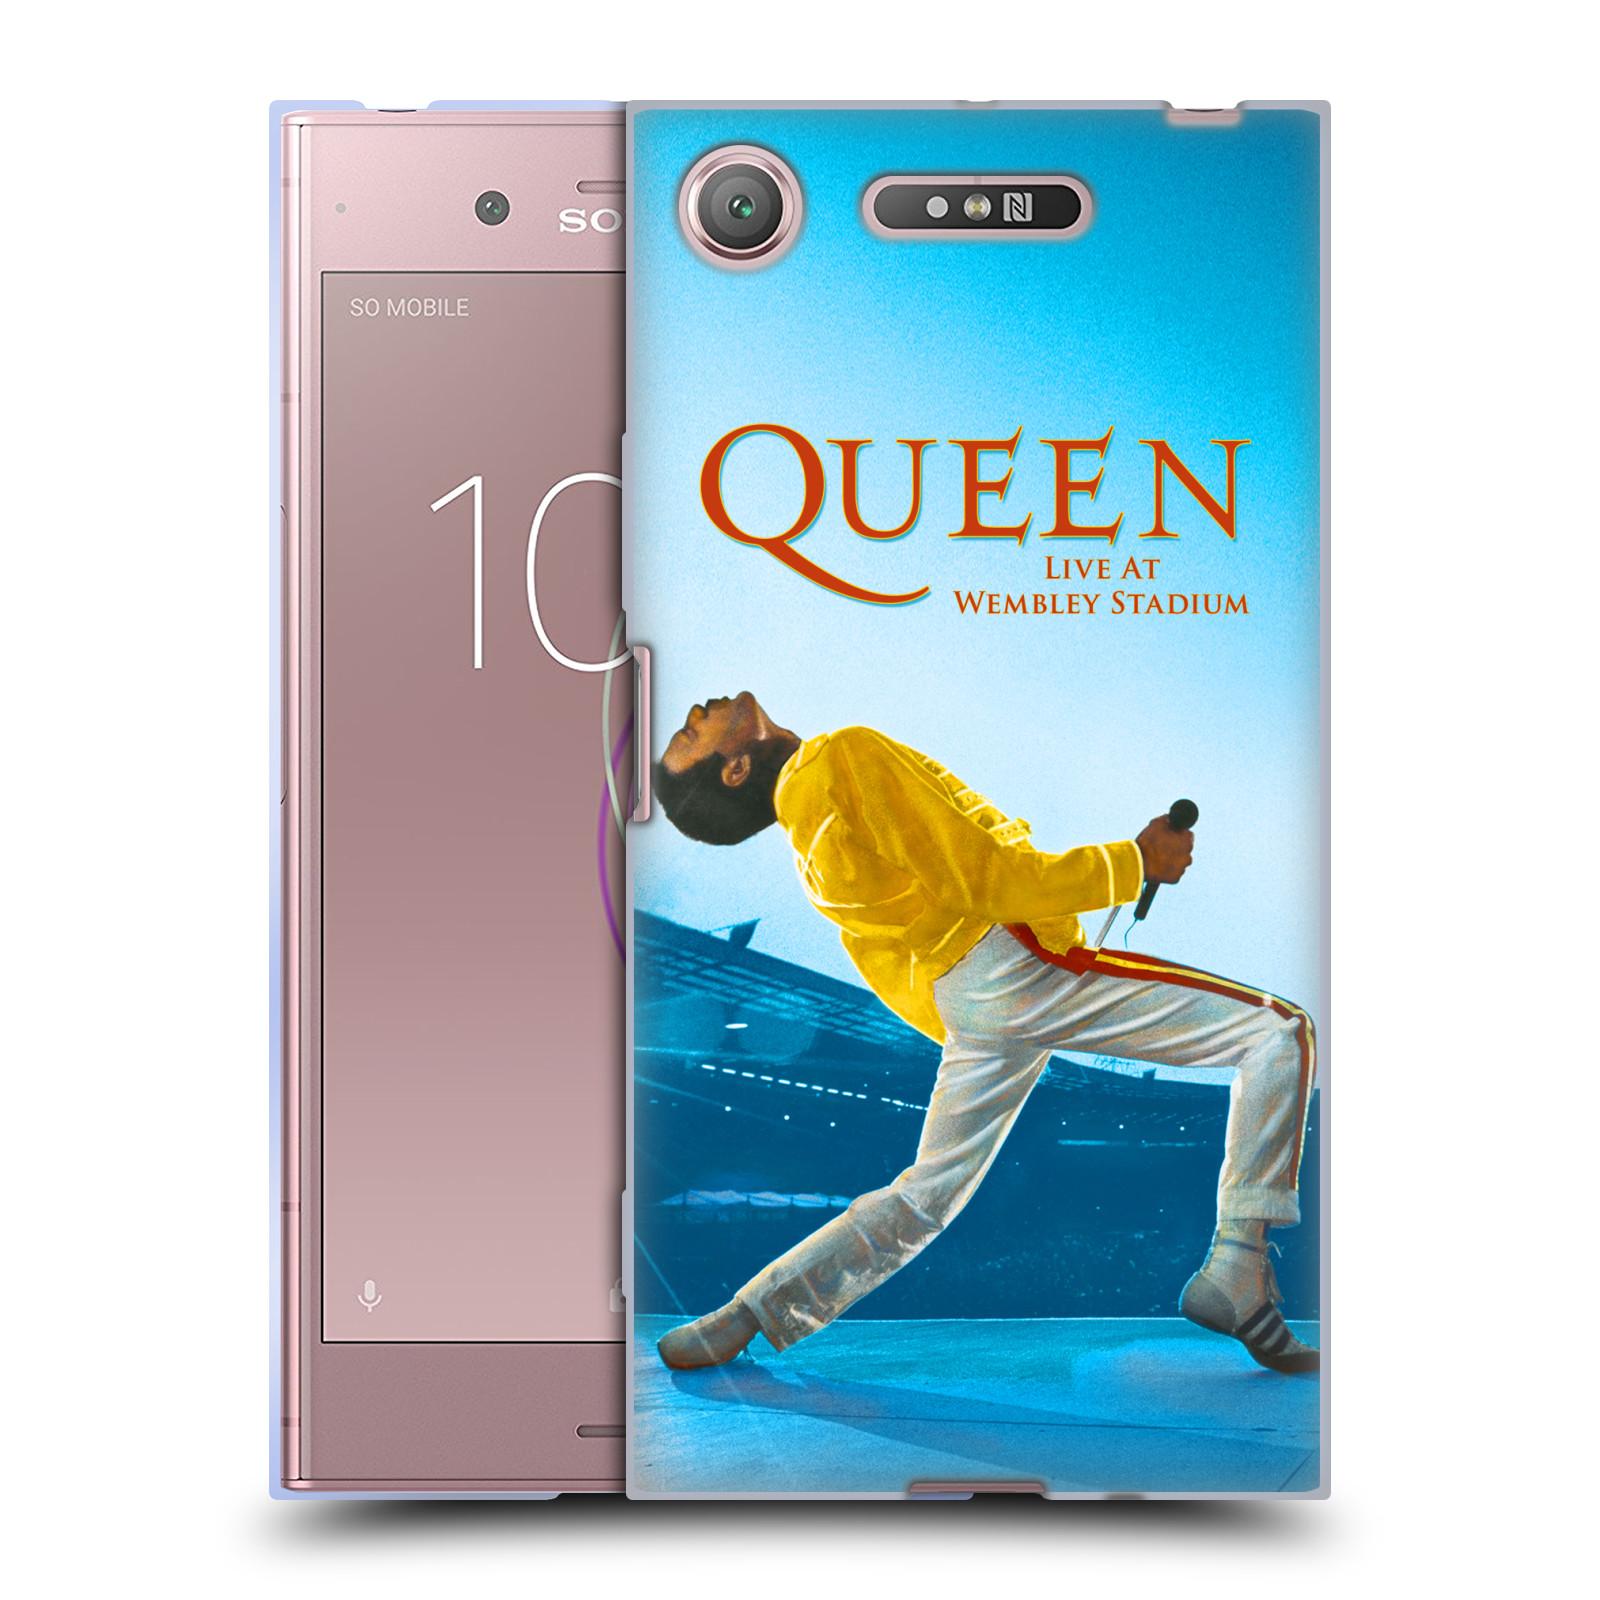 Silikonové pouzdro na mobil Sony Xperia XZ1 - Head Case - Queen - Freddie Mercury